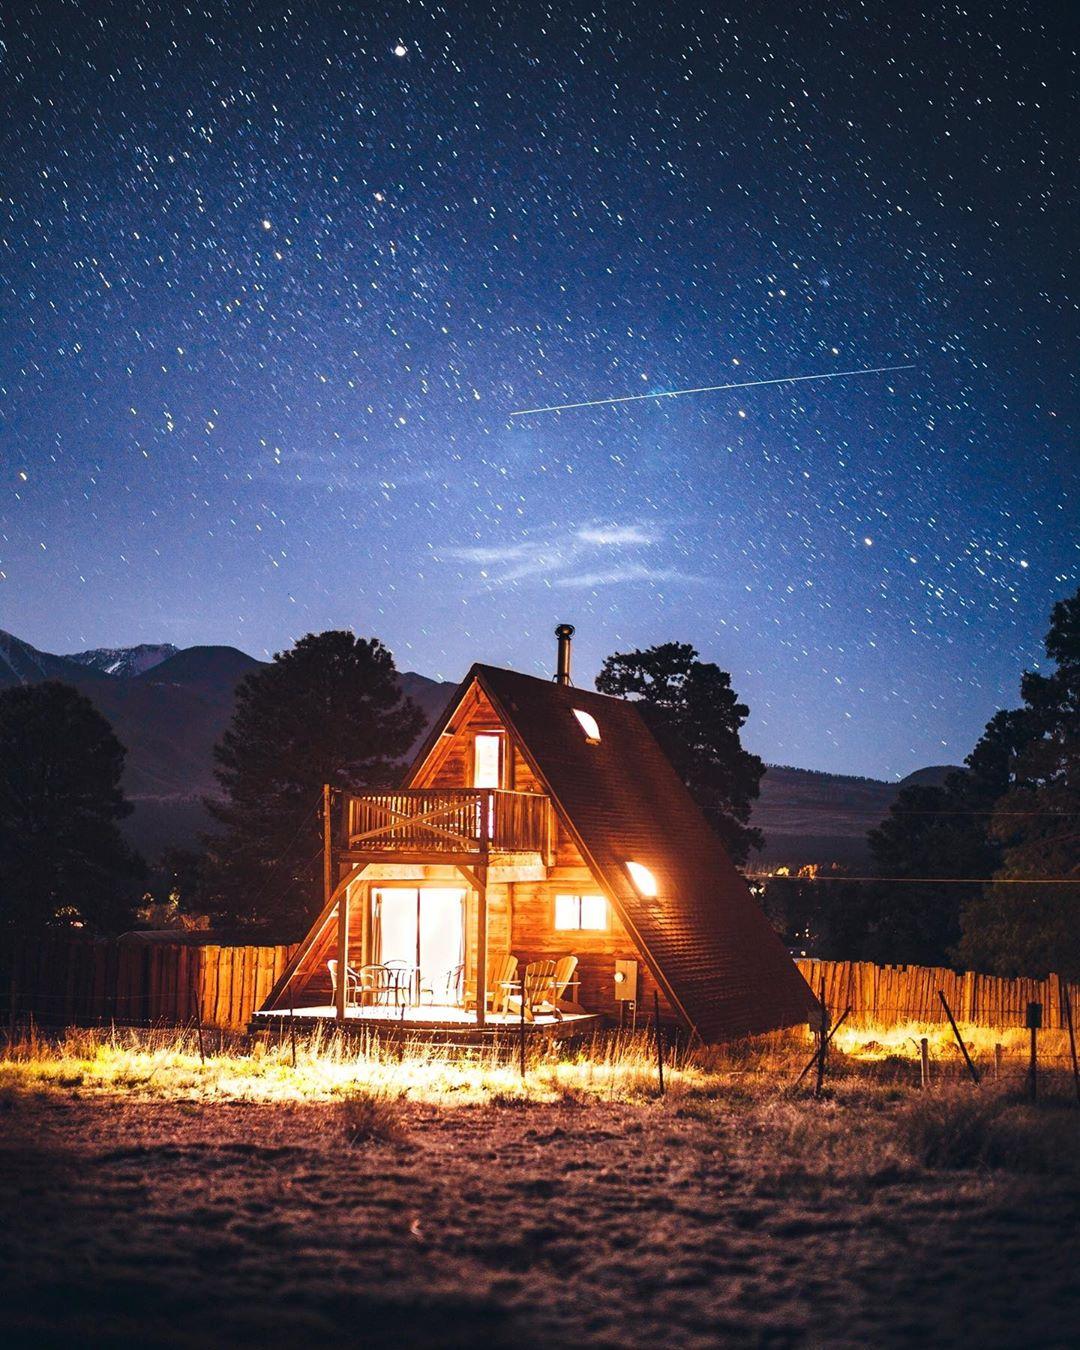 Arizona stargazing